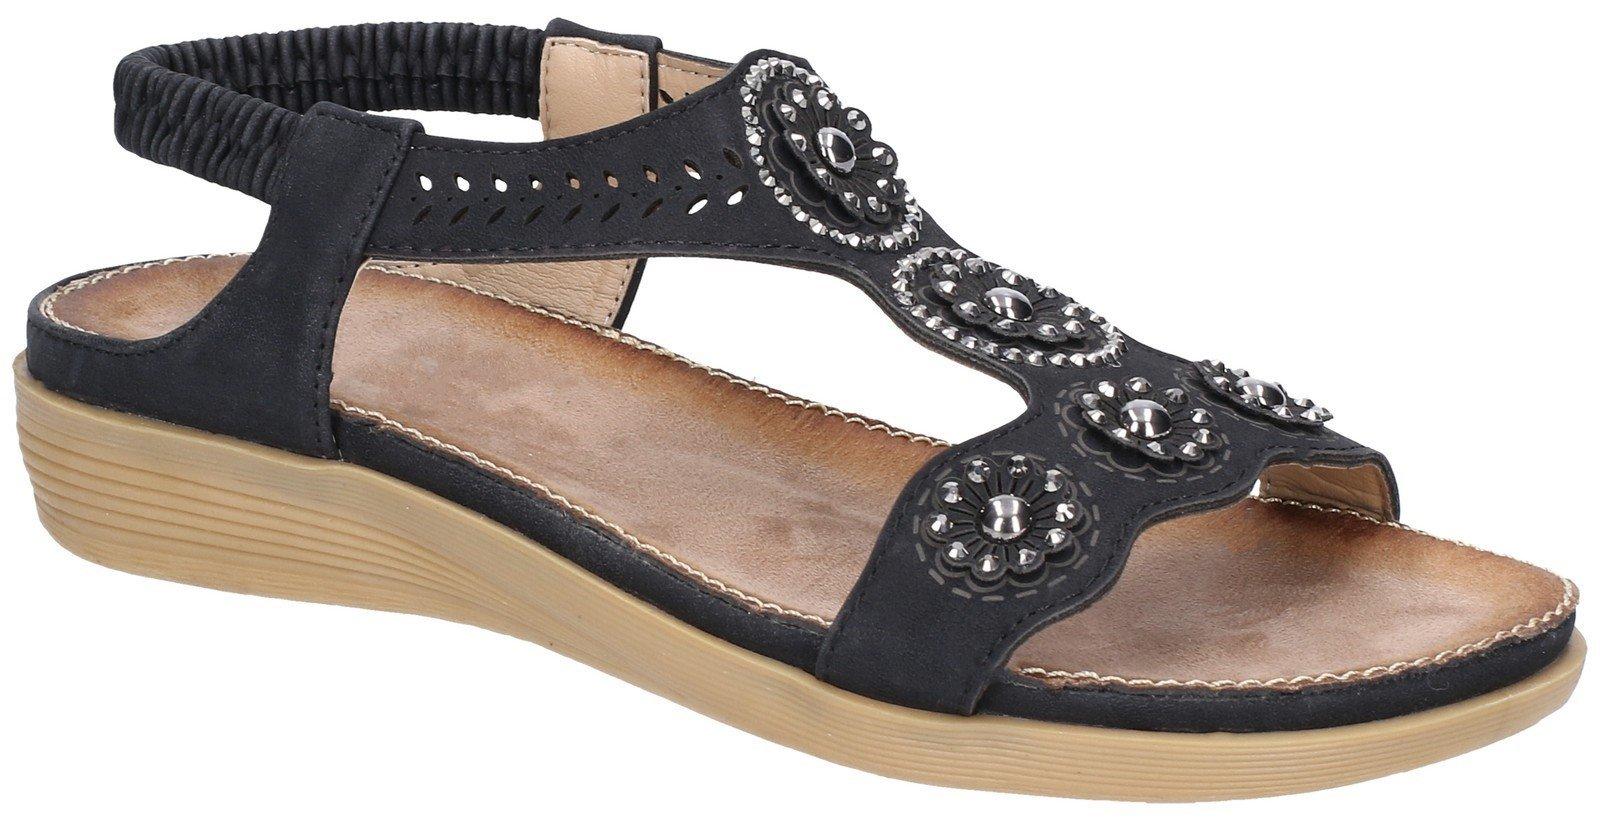 Fleet & Foster Women's Caper Elastic T-Bar Sandal Various Colours 28281 - Black 3